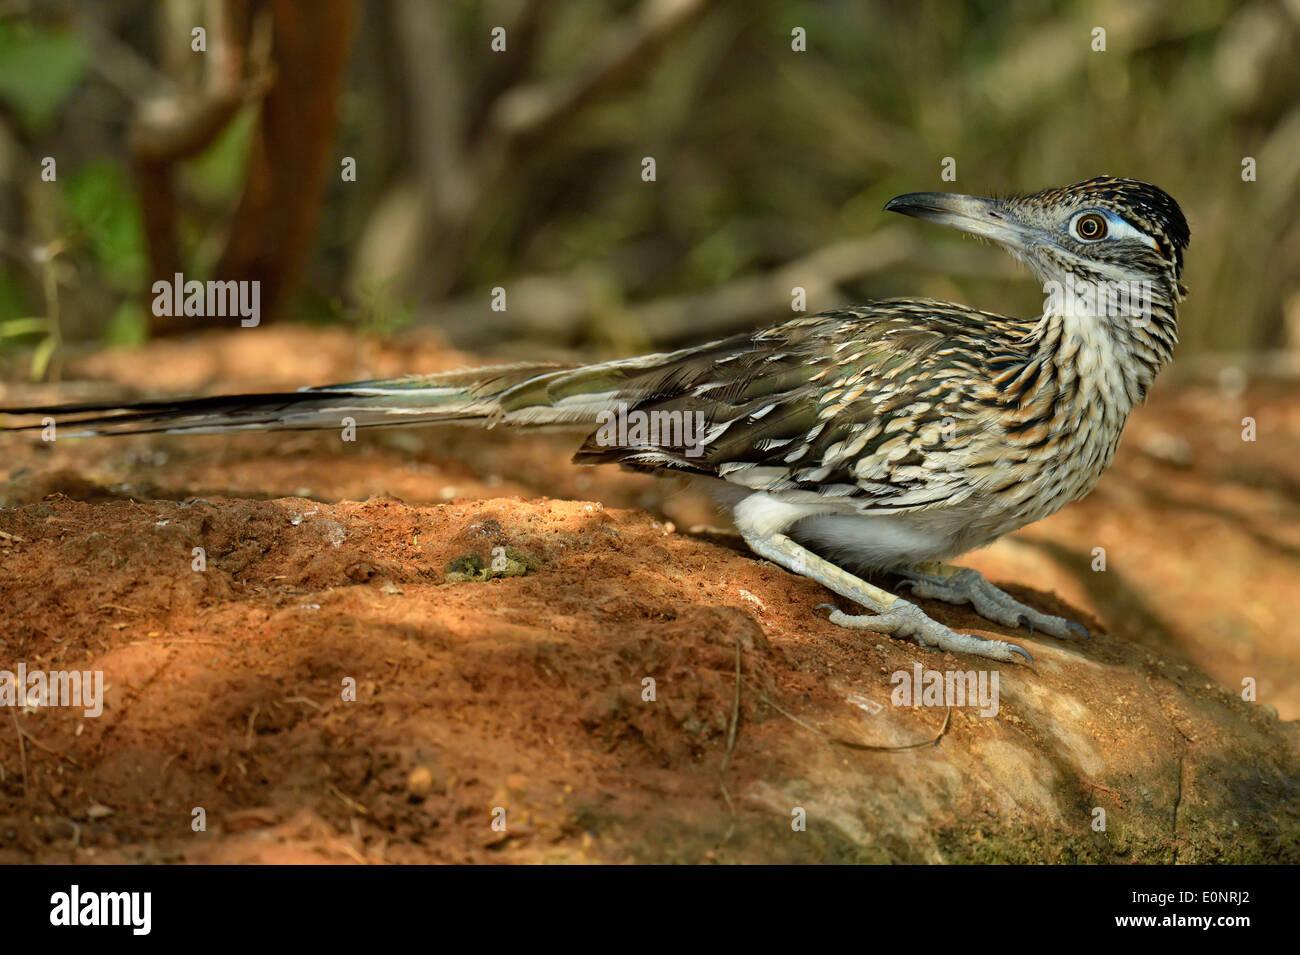 Greater Roadrunner (Geococcyx californianus), Rio Grande City, Texas, USA - Stock Image